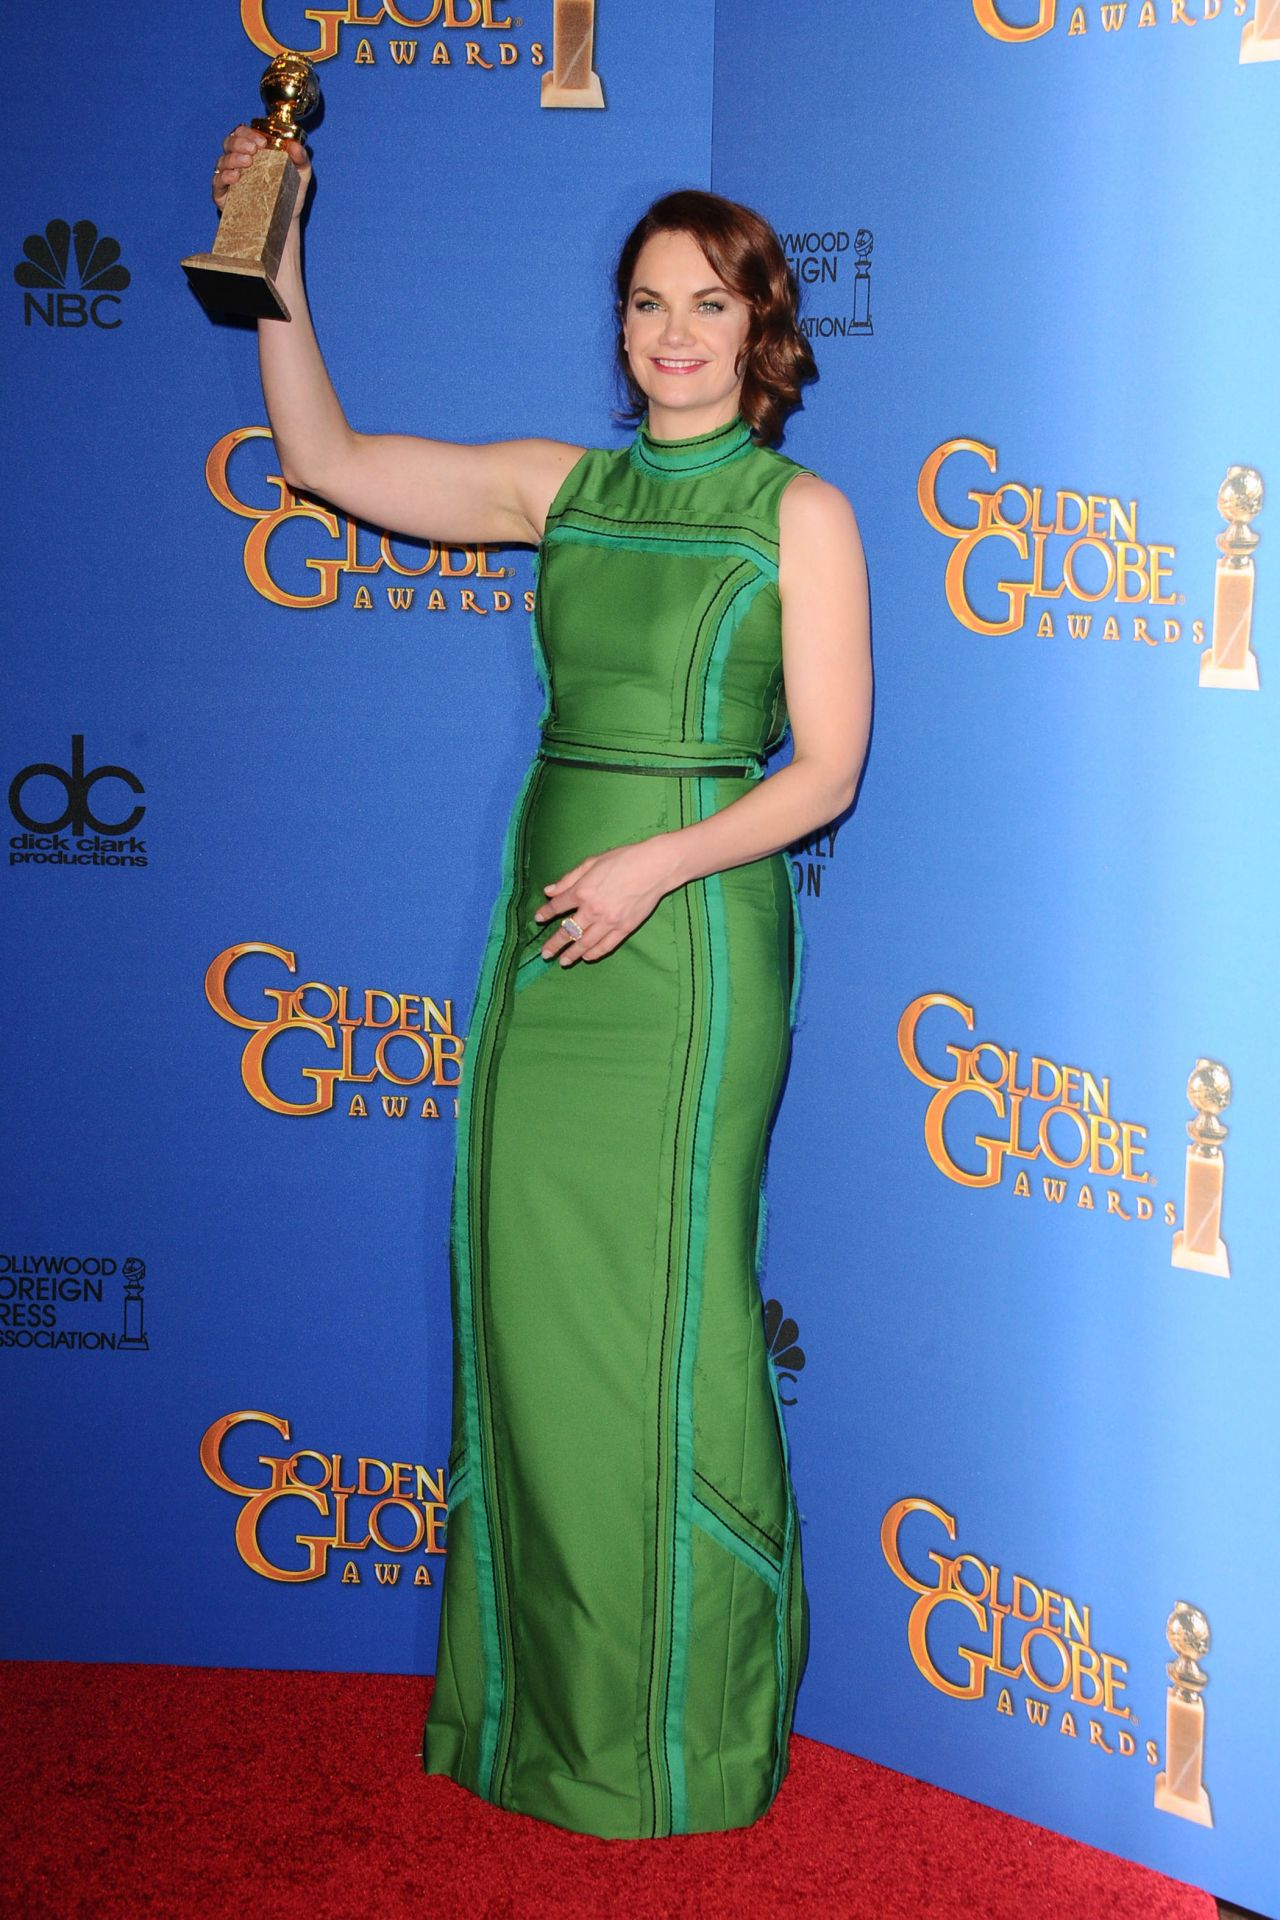 Ruth wilson 2015 golden globe awards in beverly hills